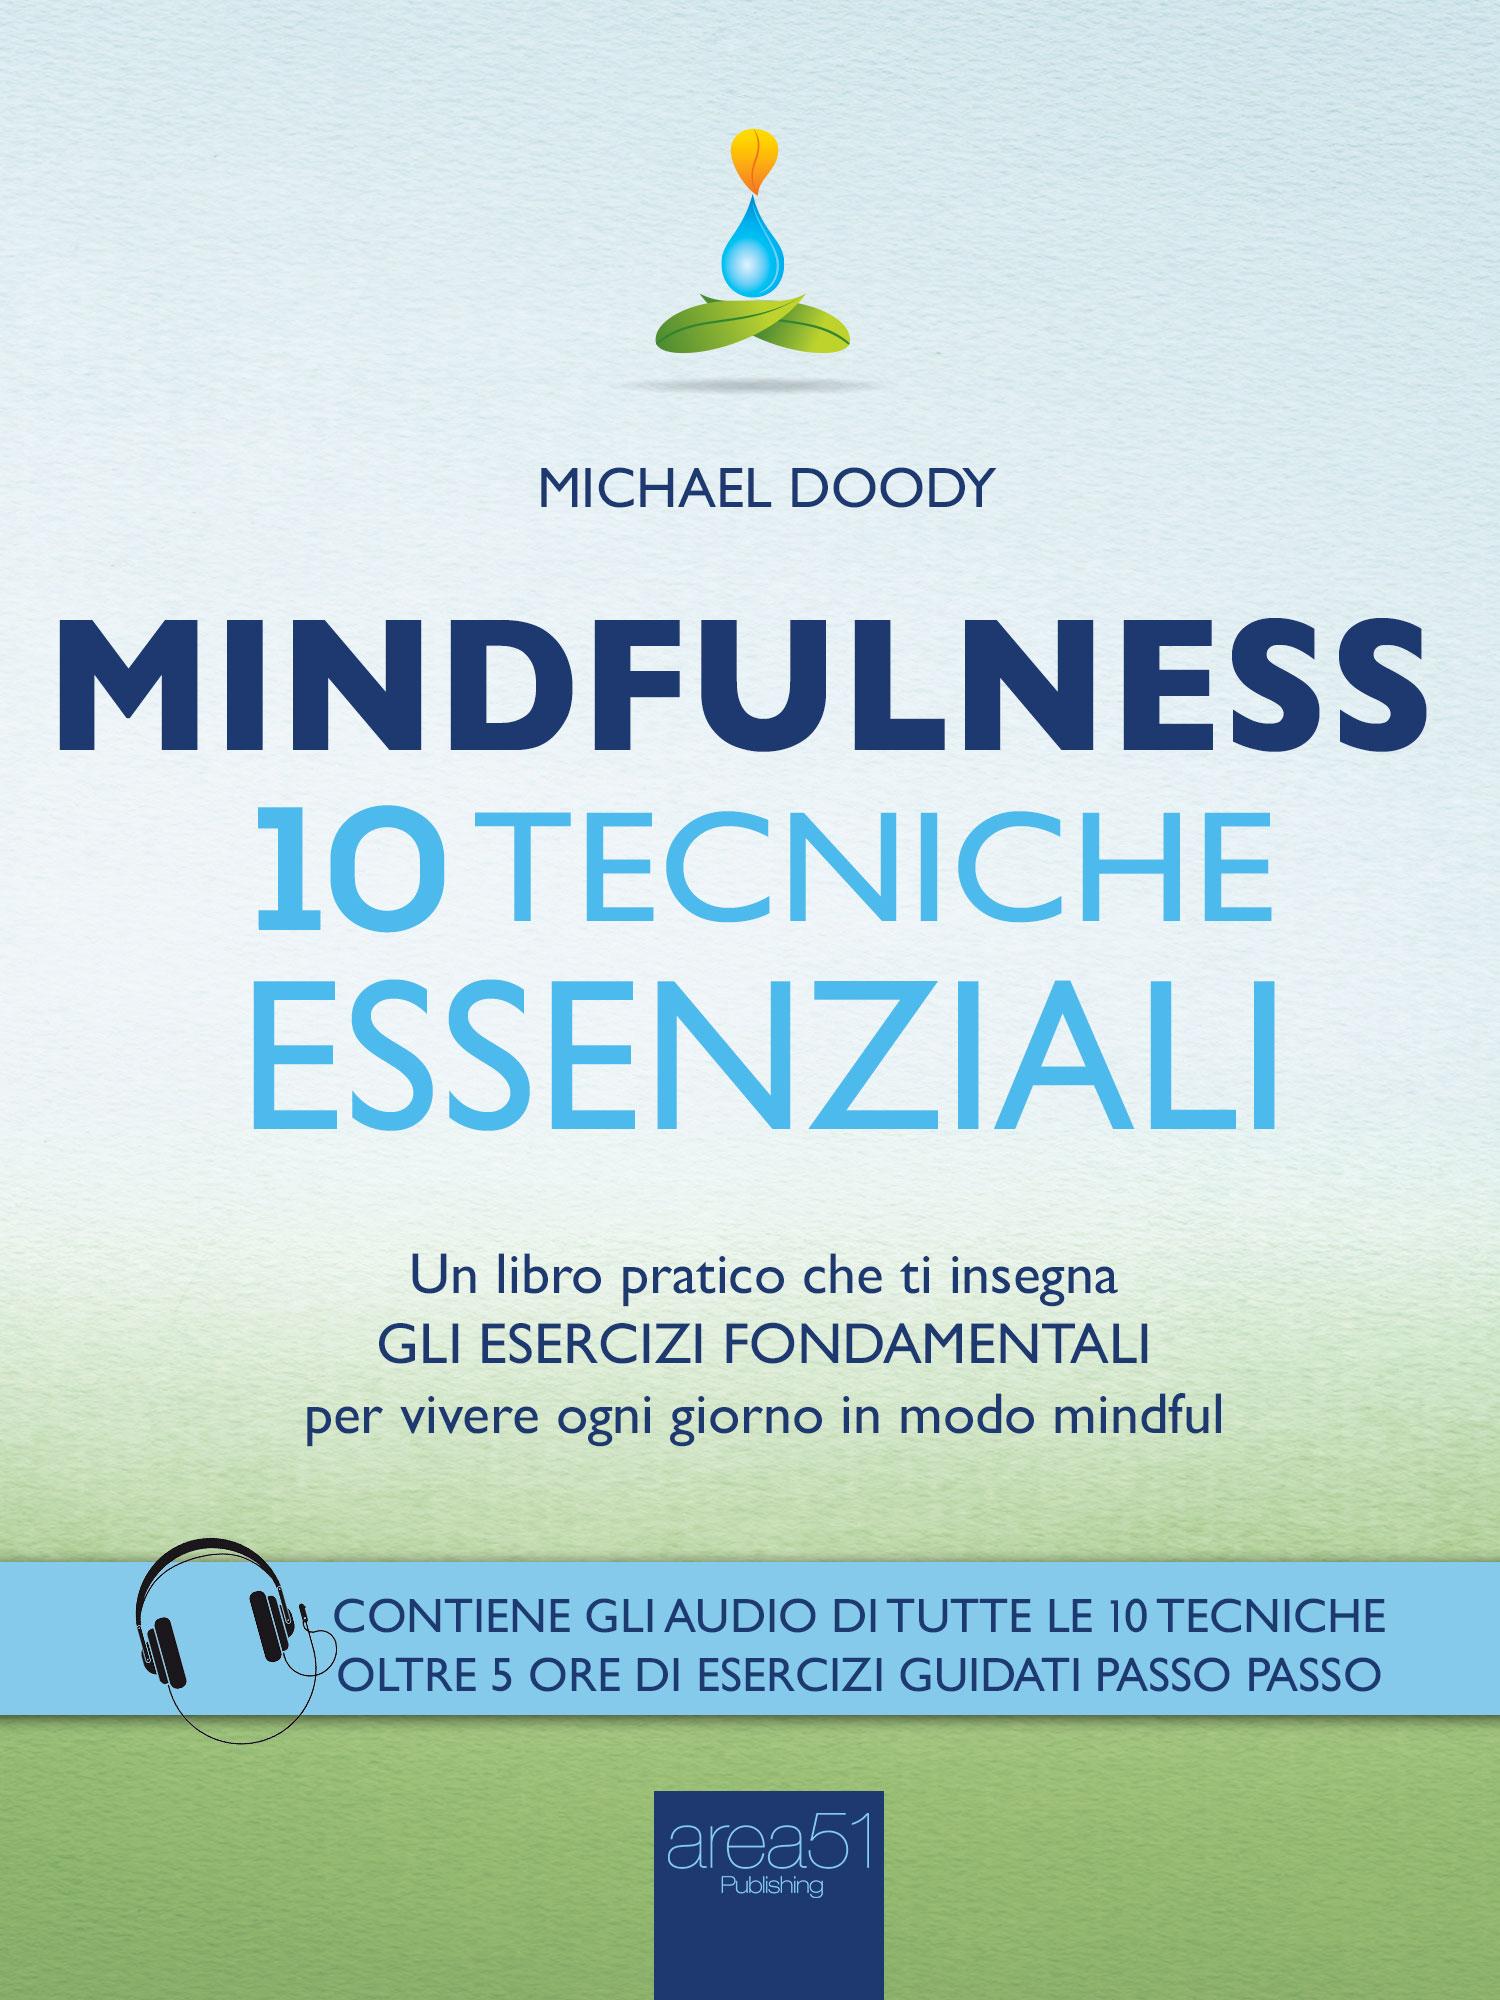 Mindfulness. 10 tecniche essenziali.-0